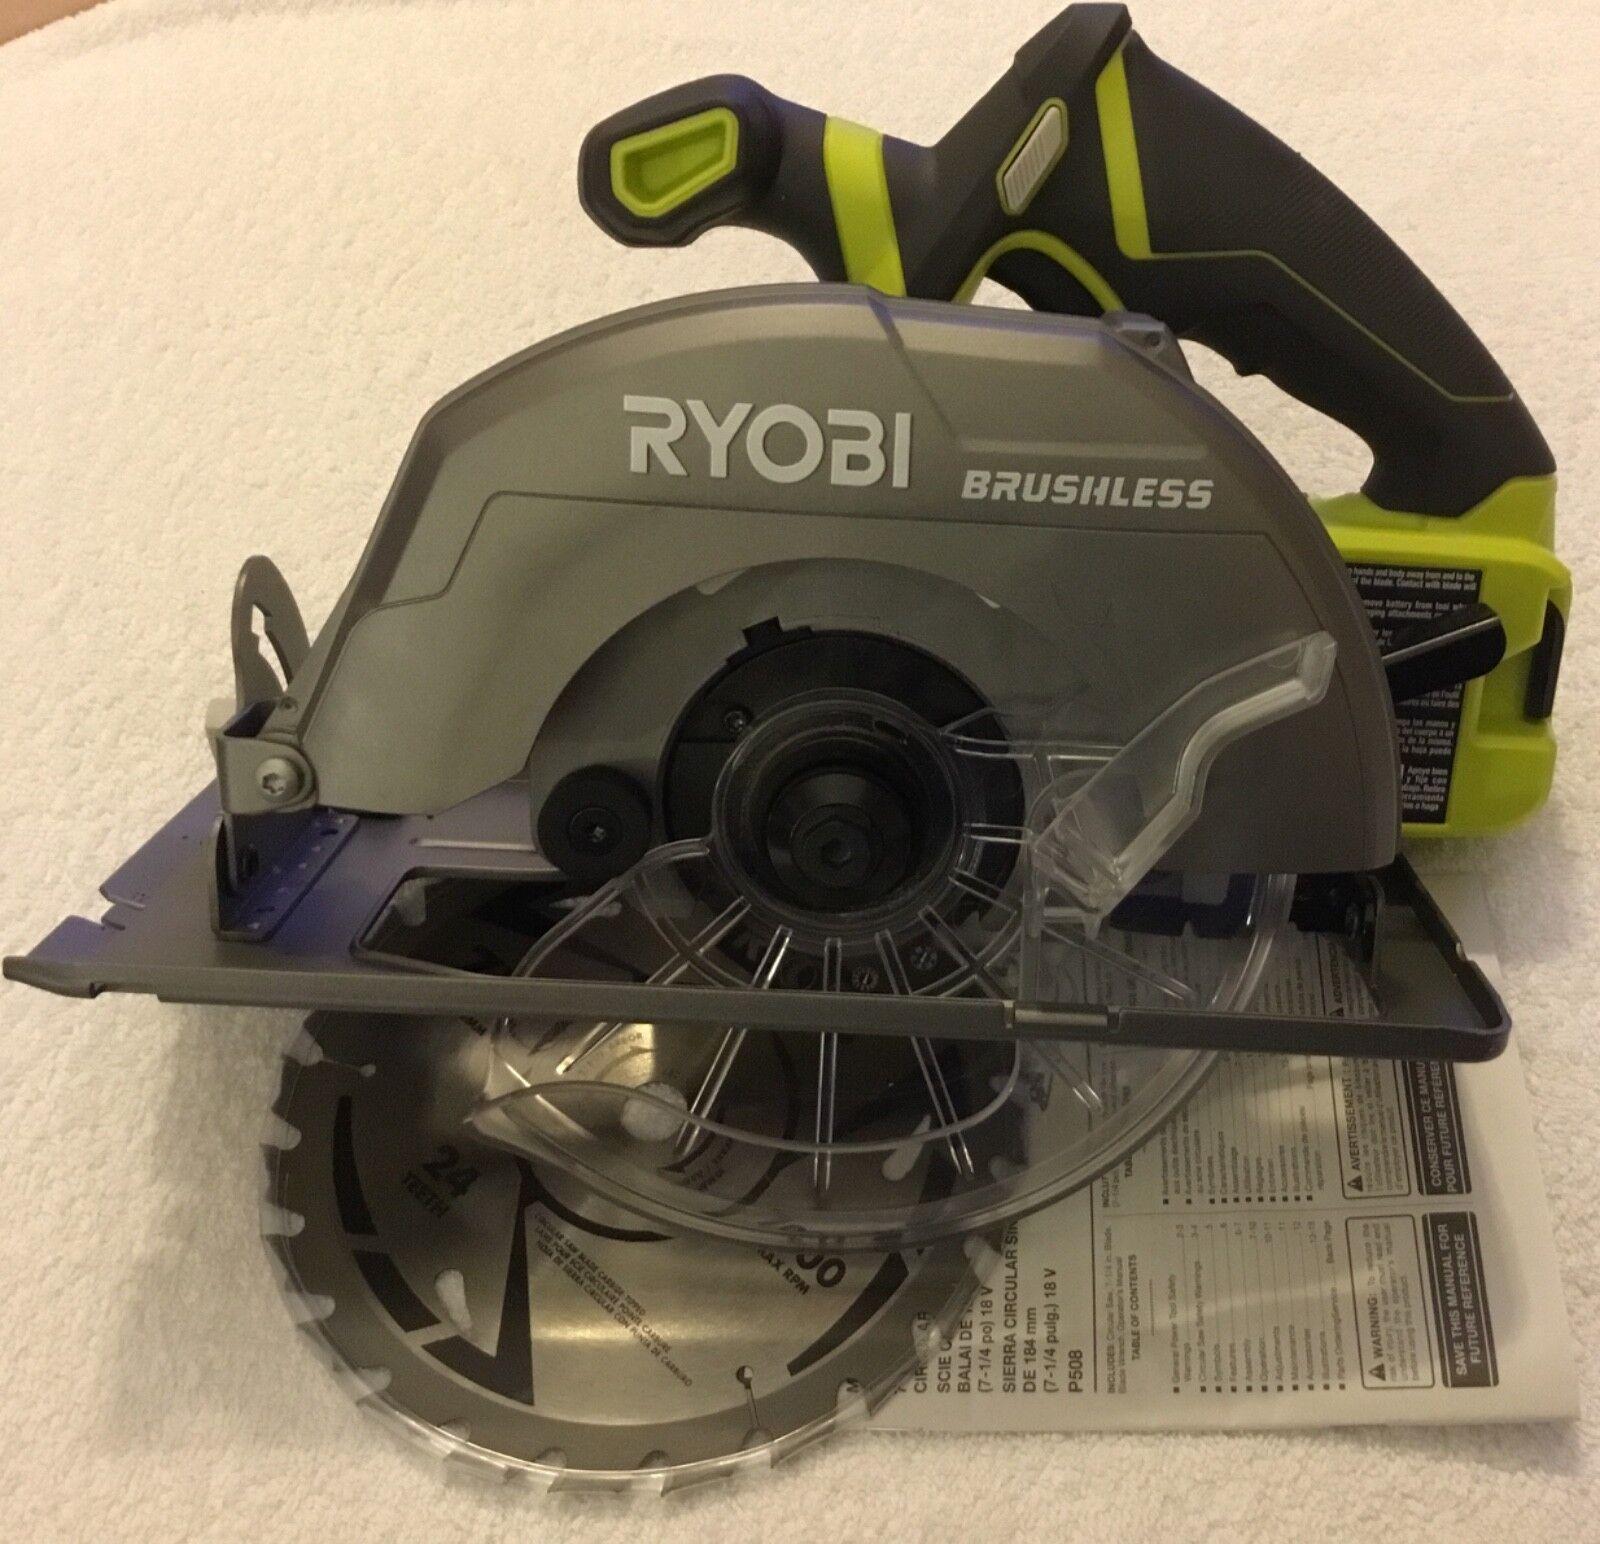 New Ryobi P508 One+18 Volt Brushless Cordless 7-1/4 Circular